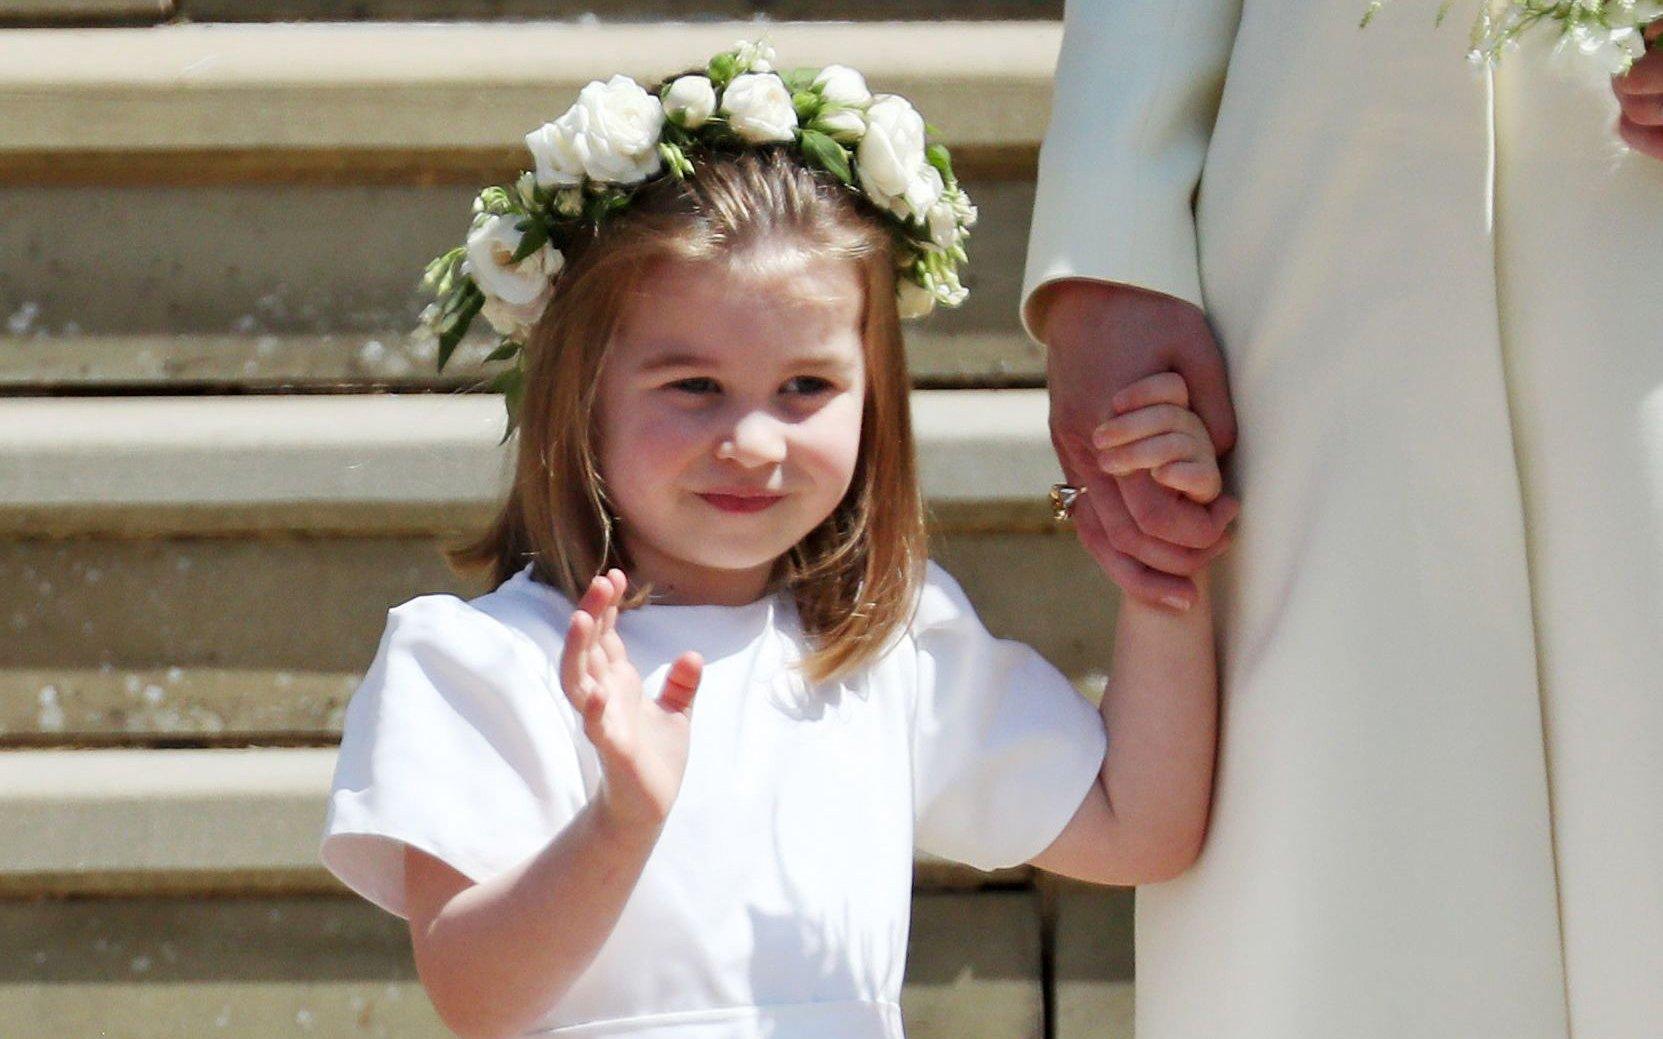 Princess Charlotte of Cambridge gives a wave at the #RoyalWedding https://t.co/Oqw4xZ724f https://t.co/oZjjjlX4xa